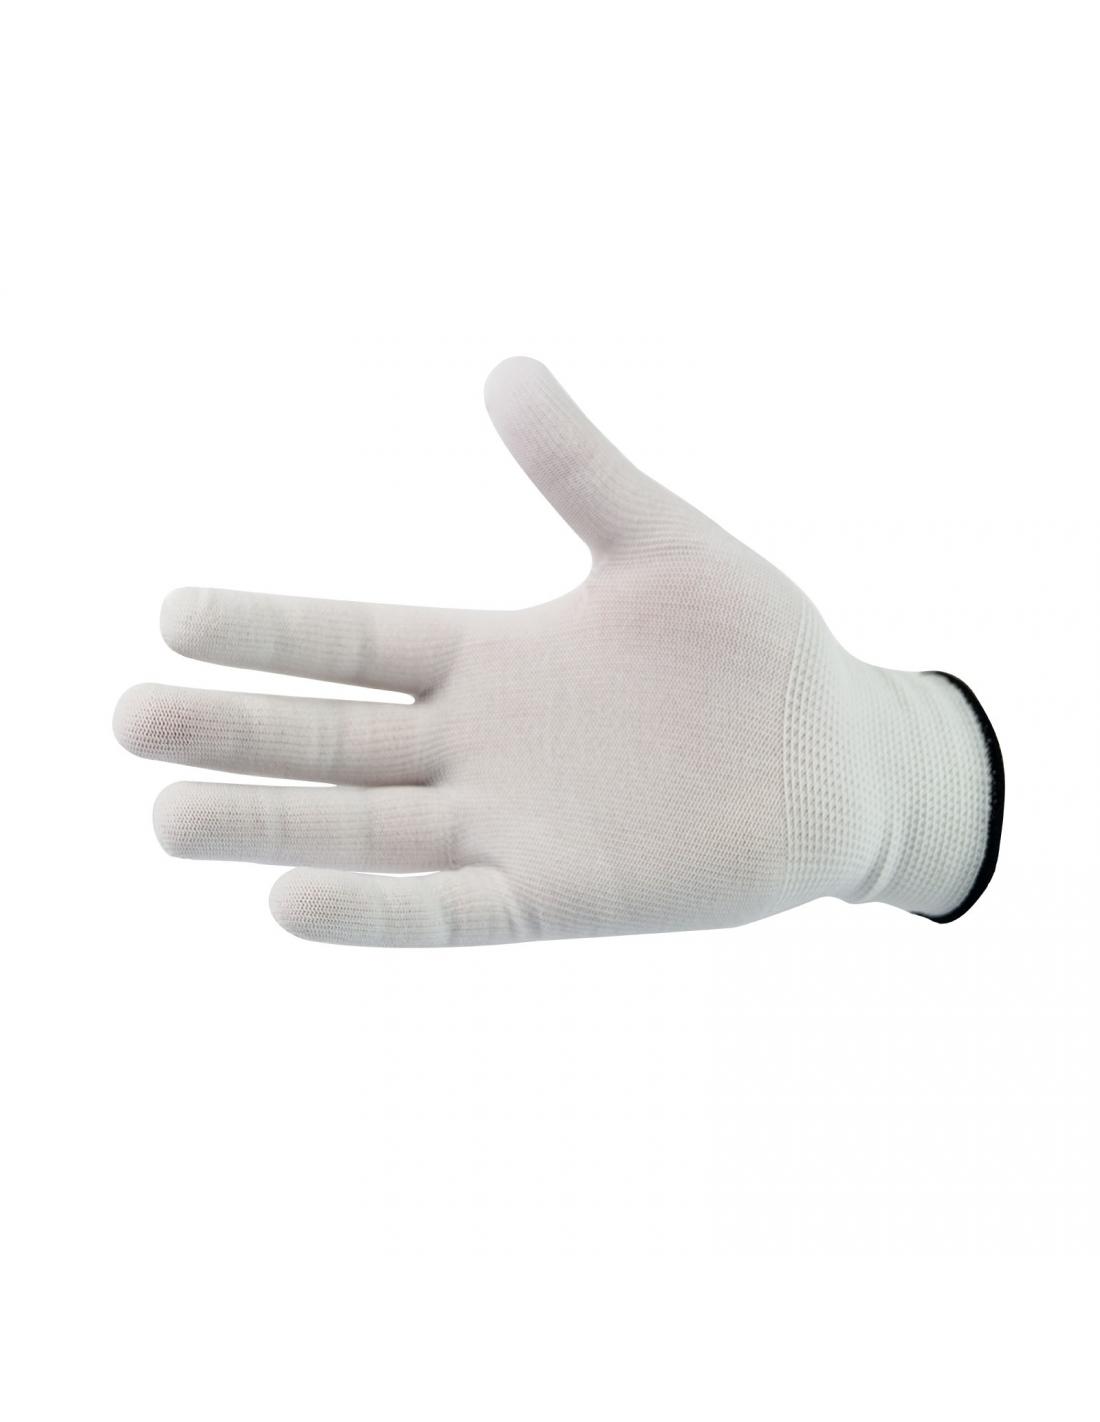 Profi Handschuhe